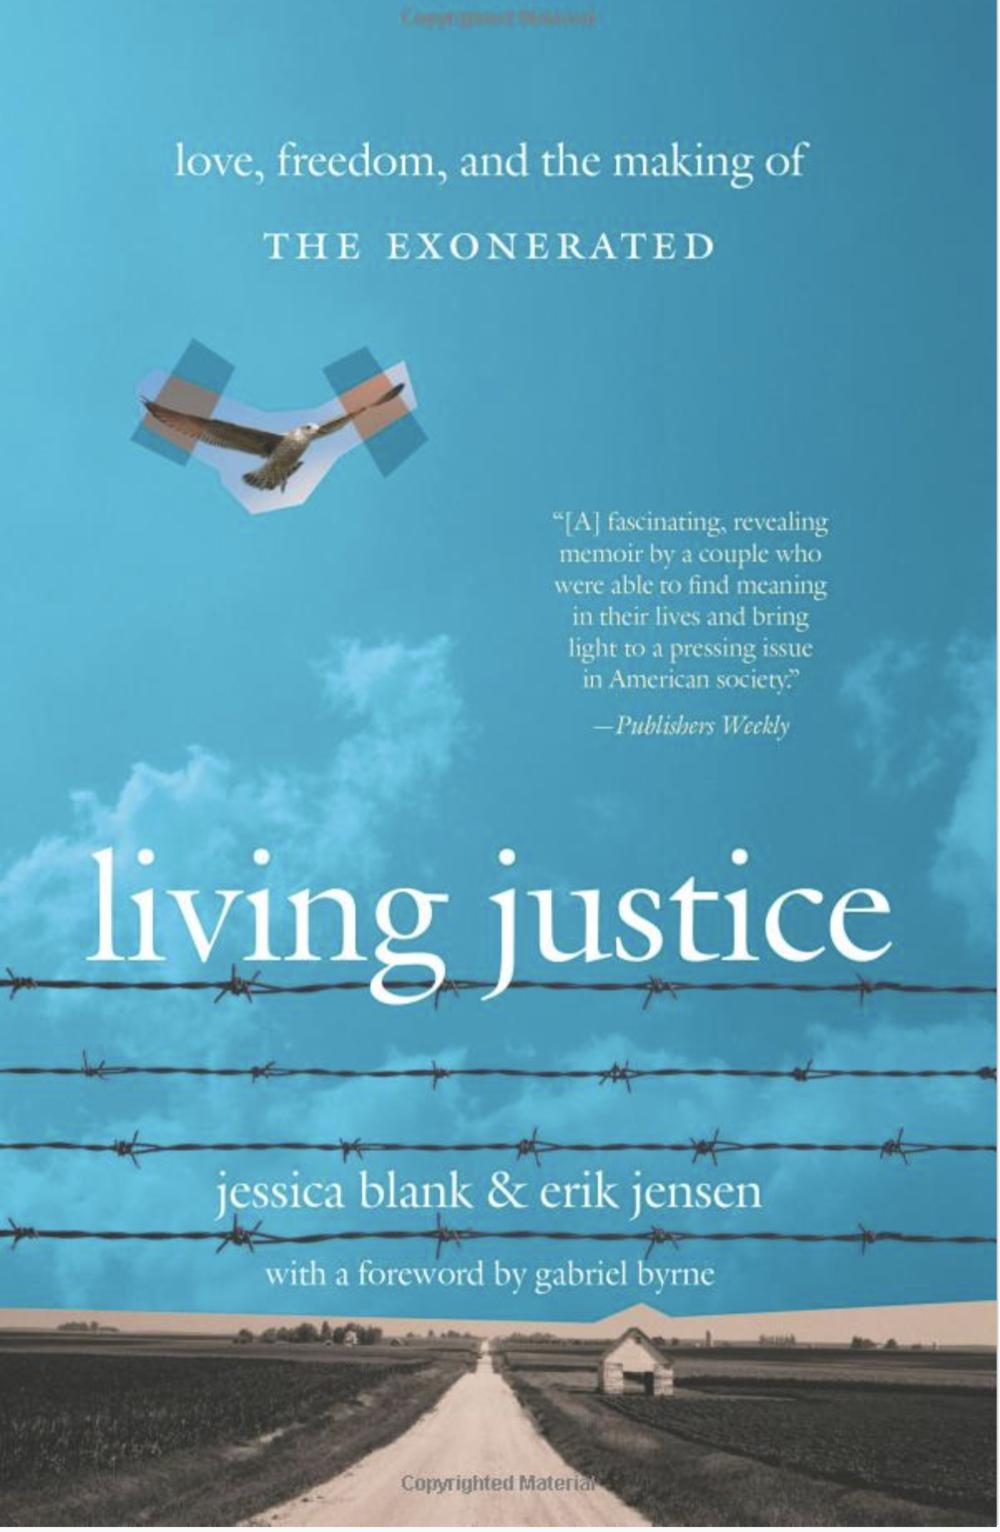 Book: Living Justice - By Jessica Blank & Erik Jensen